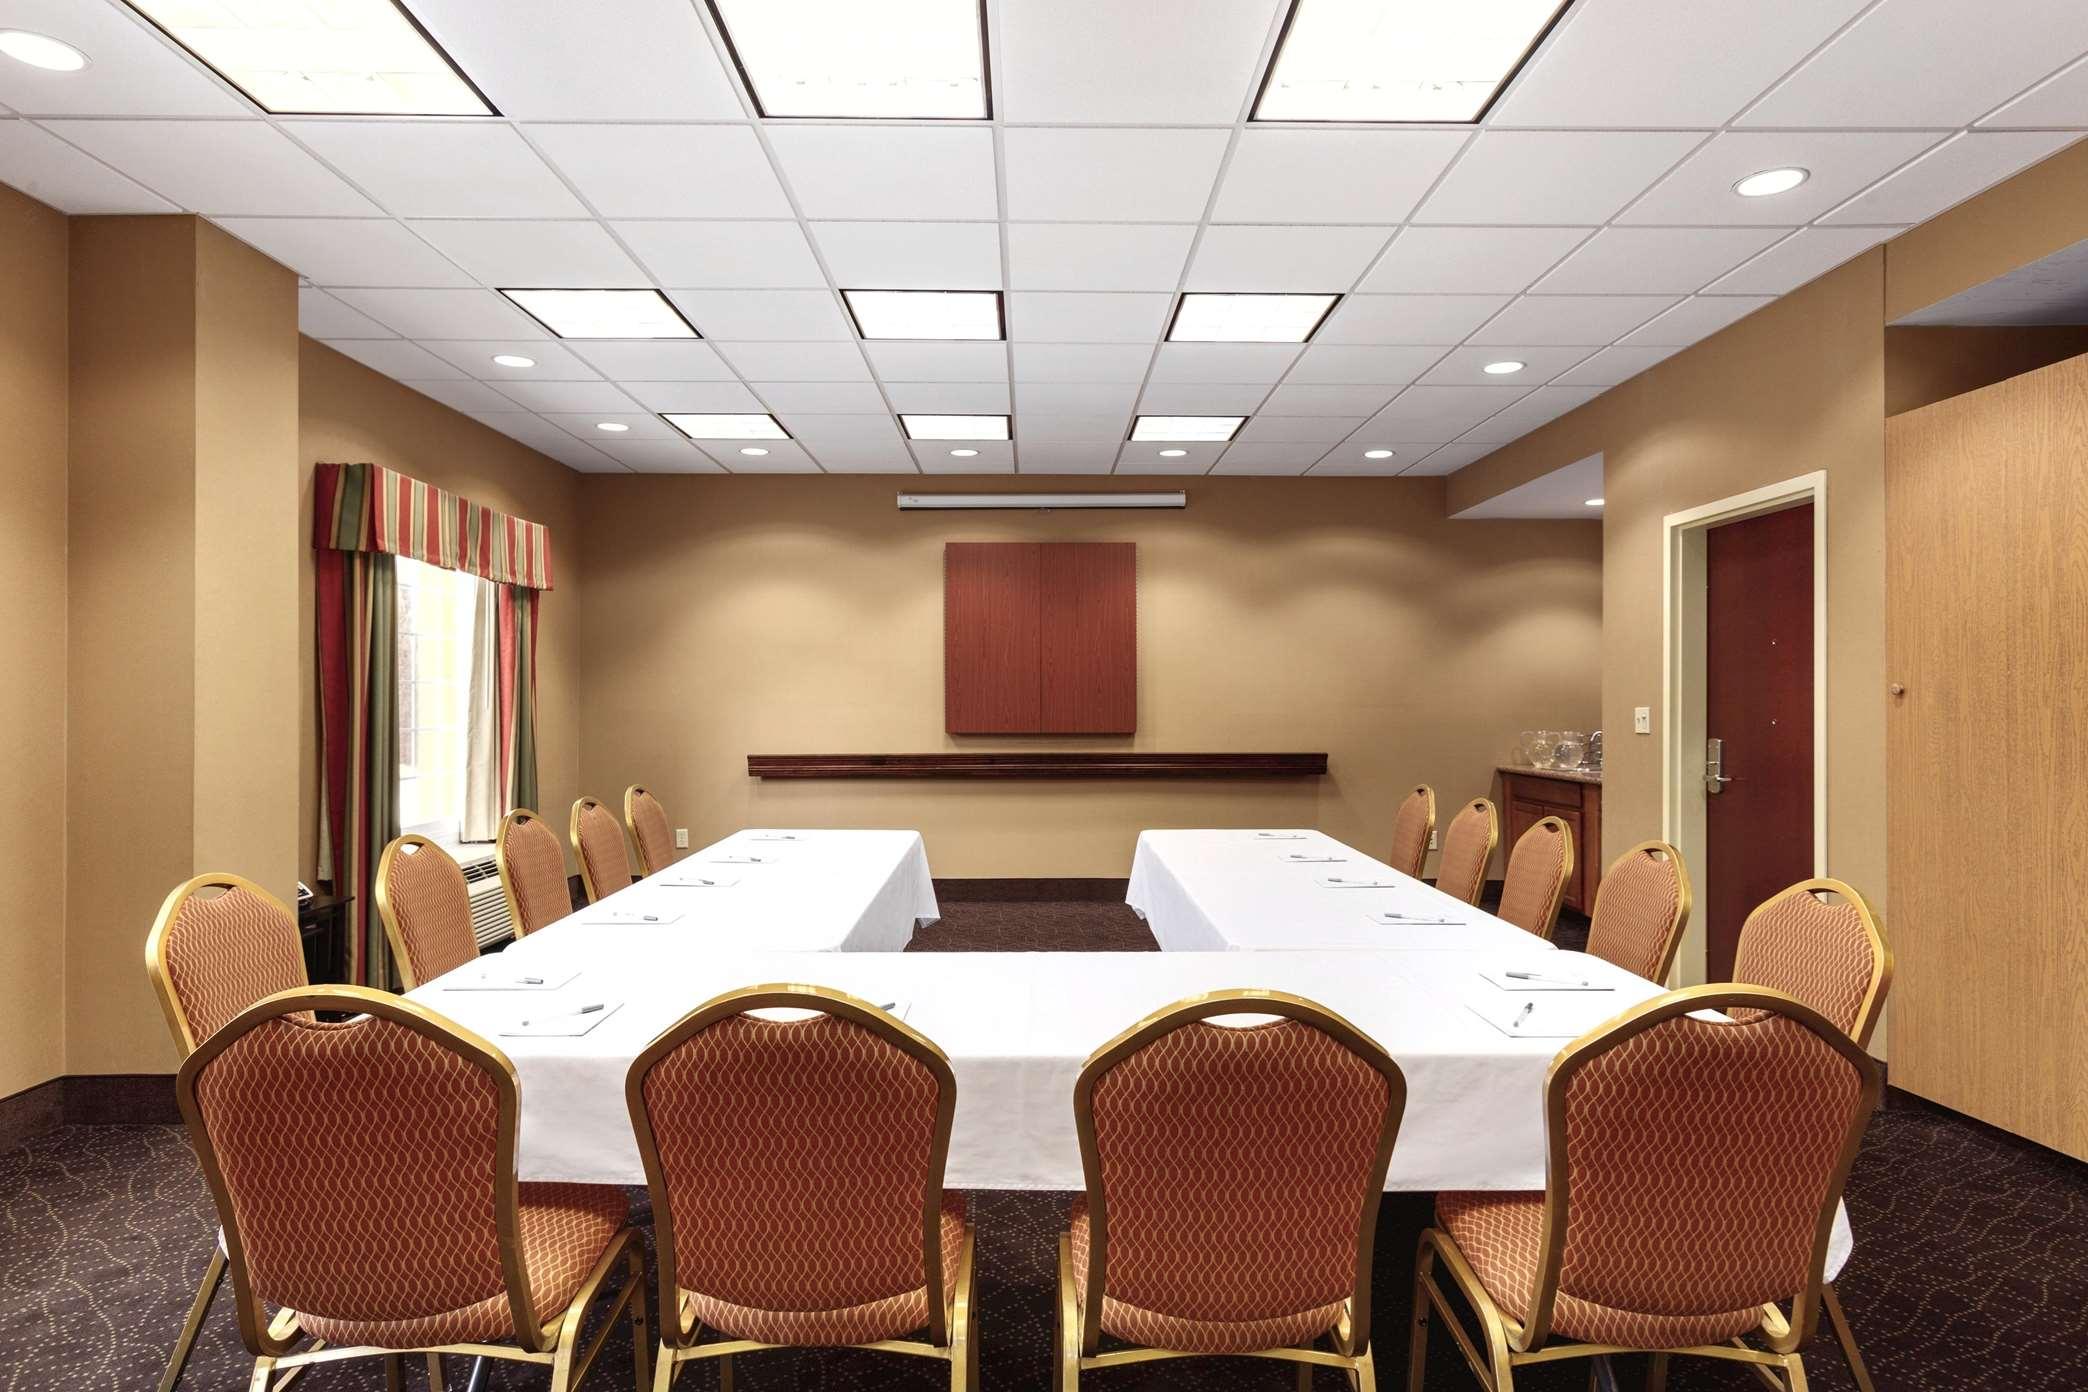 Hampton Inn & Suites Greenfield image 27